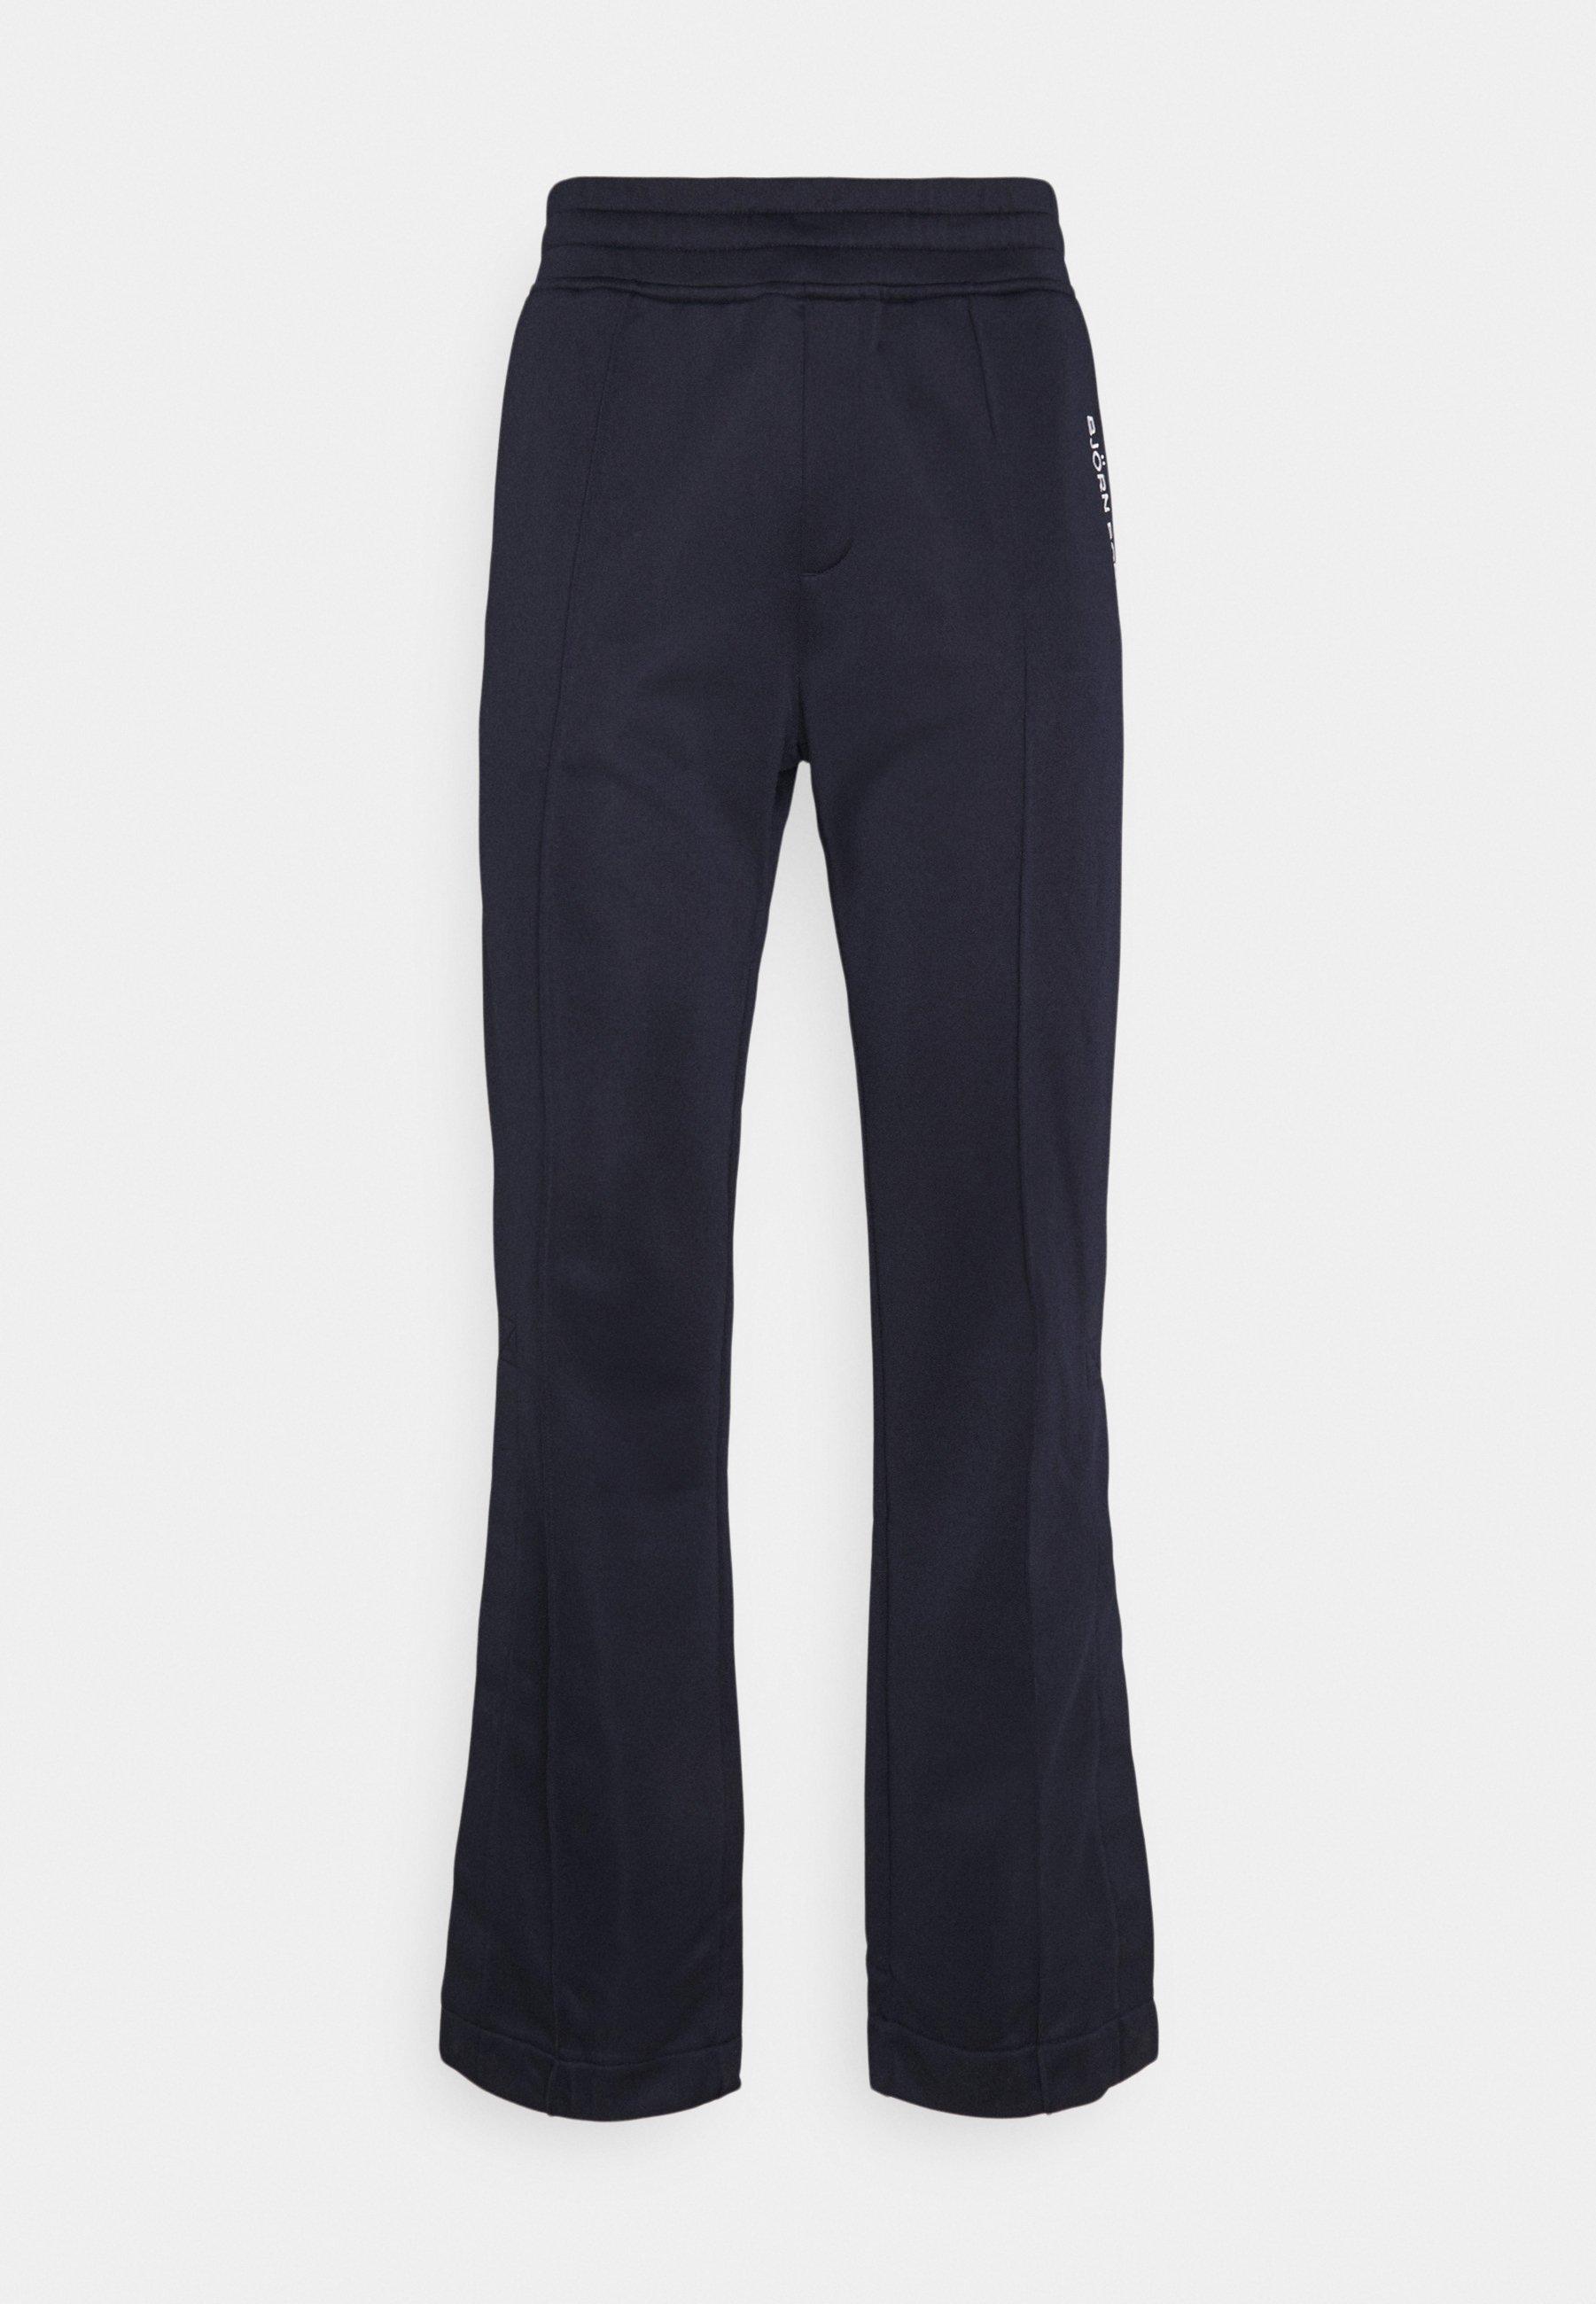 Men SPORT TRACK PANTS - Tracksuit bottoms